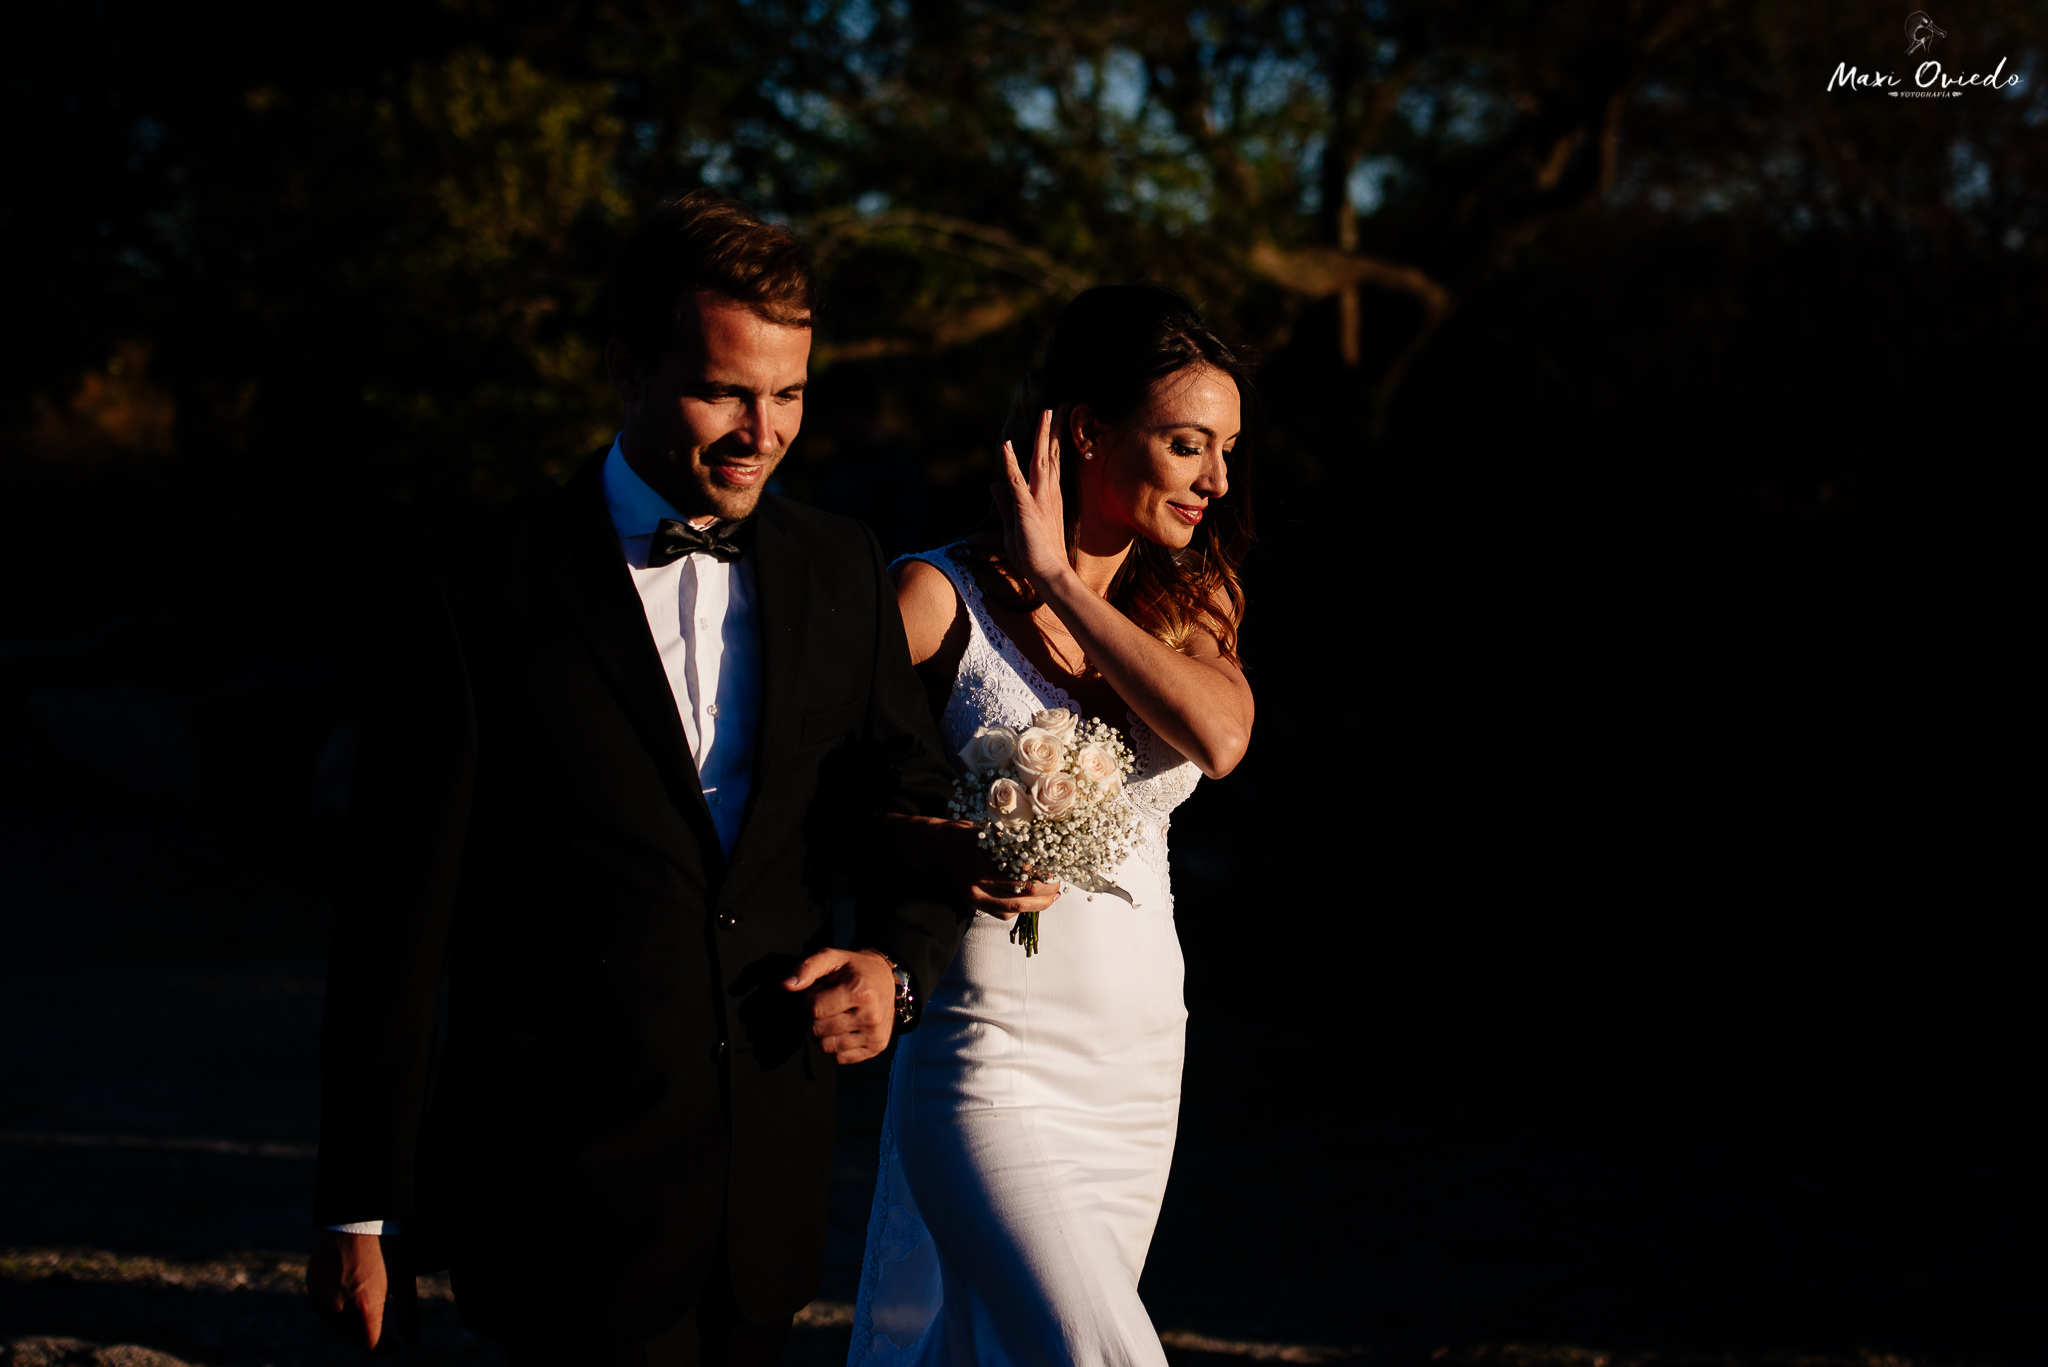 boda sextuple la cumbre cordoba cuchi corral fotografo de bodas fotografo de casamientos rosario san nicolas argentina vestido de novia ramo de novia-27.jpg